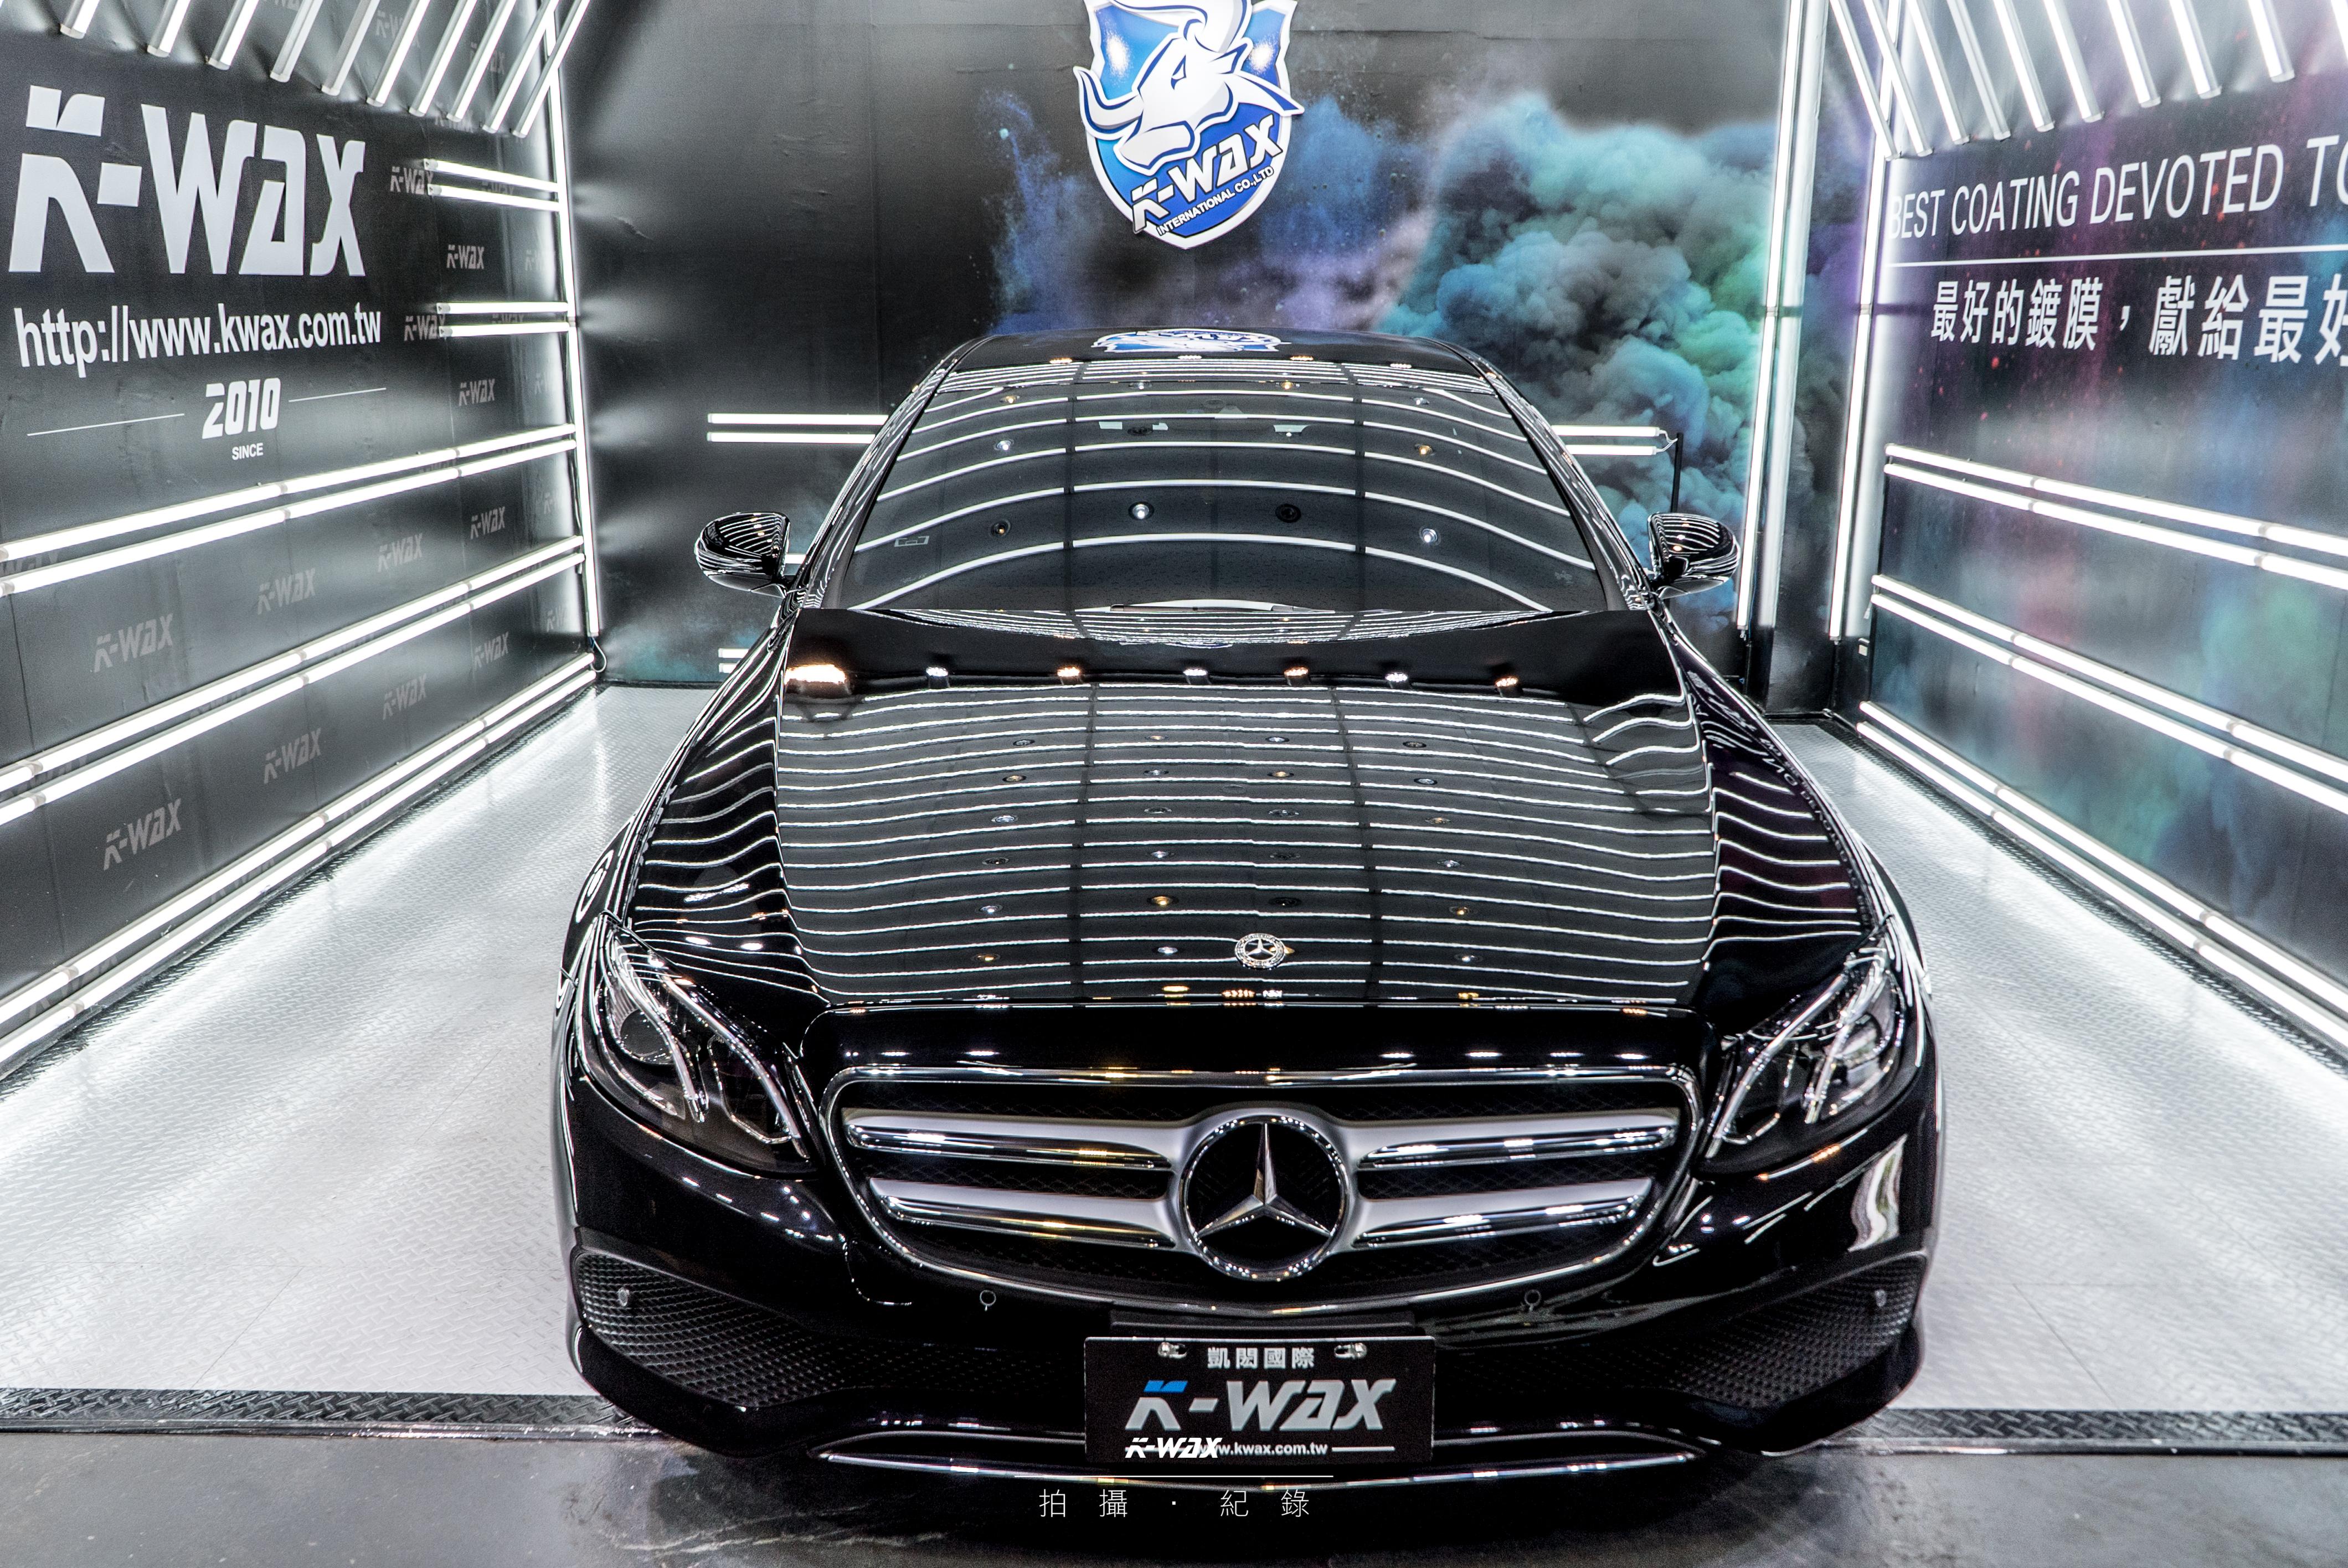 K-WAX NSC 奈米超級鍍膜 Benz E200 NSC鍍膜